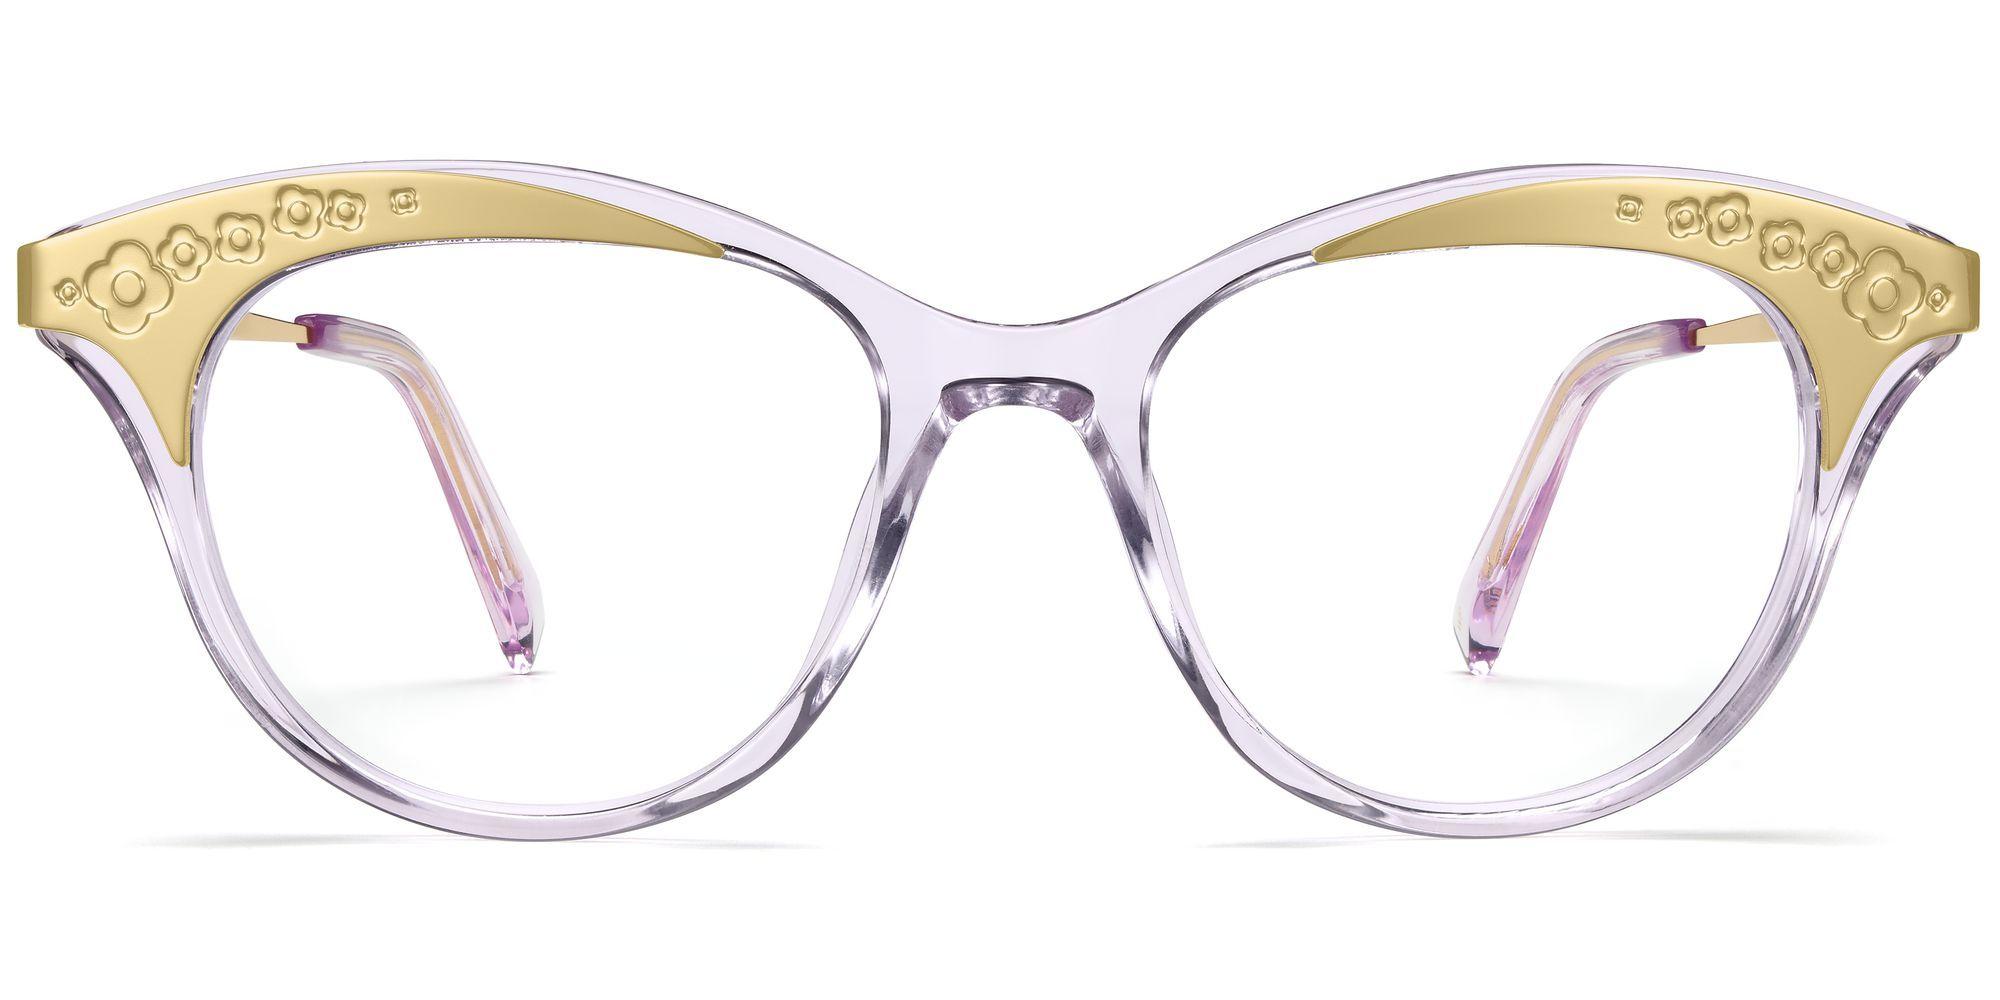 18f2b38d8fdf Christabel Eyeglasses in Lavender Crystal for Women. With gilded sweeps of  floral filigree